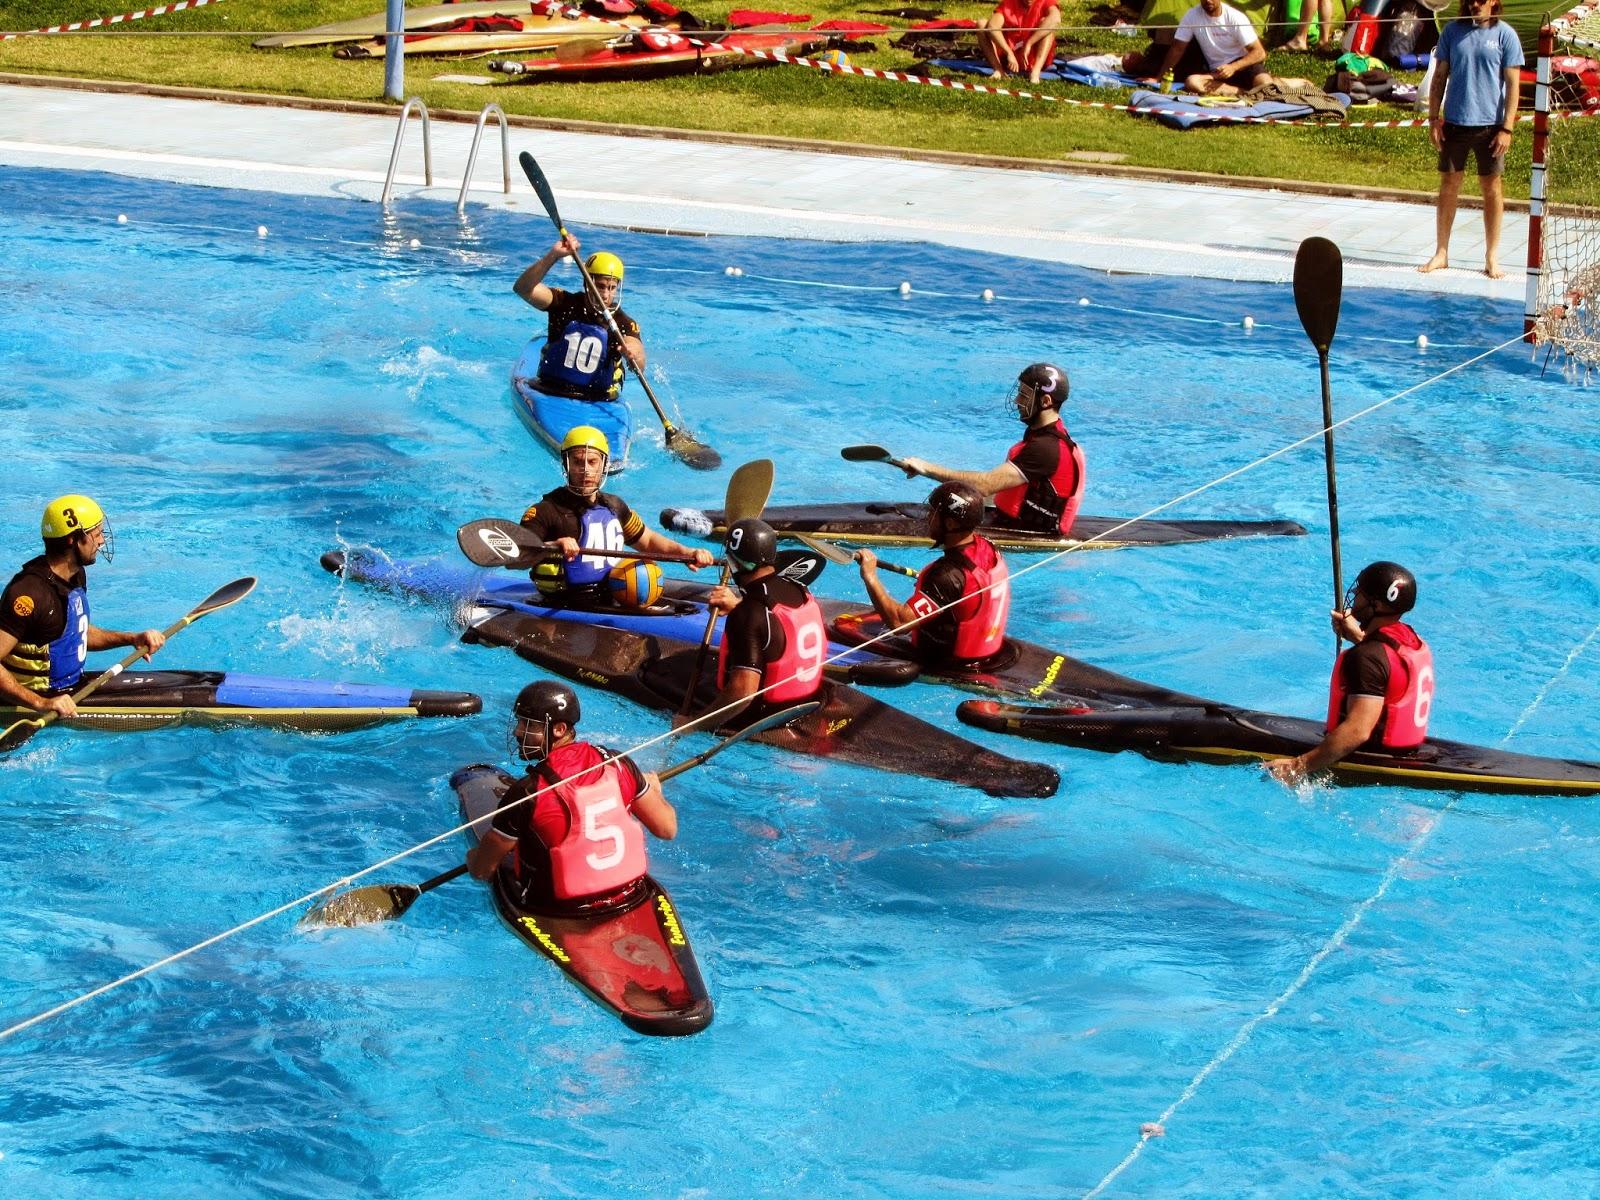 Club pirag isme silla kayak polo club pirag isme silla for Sillas para kayak